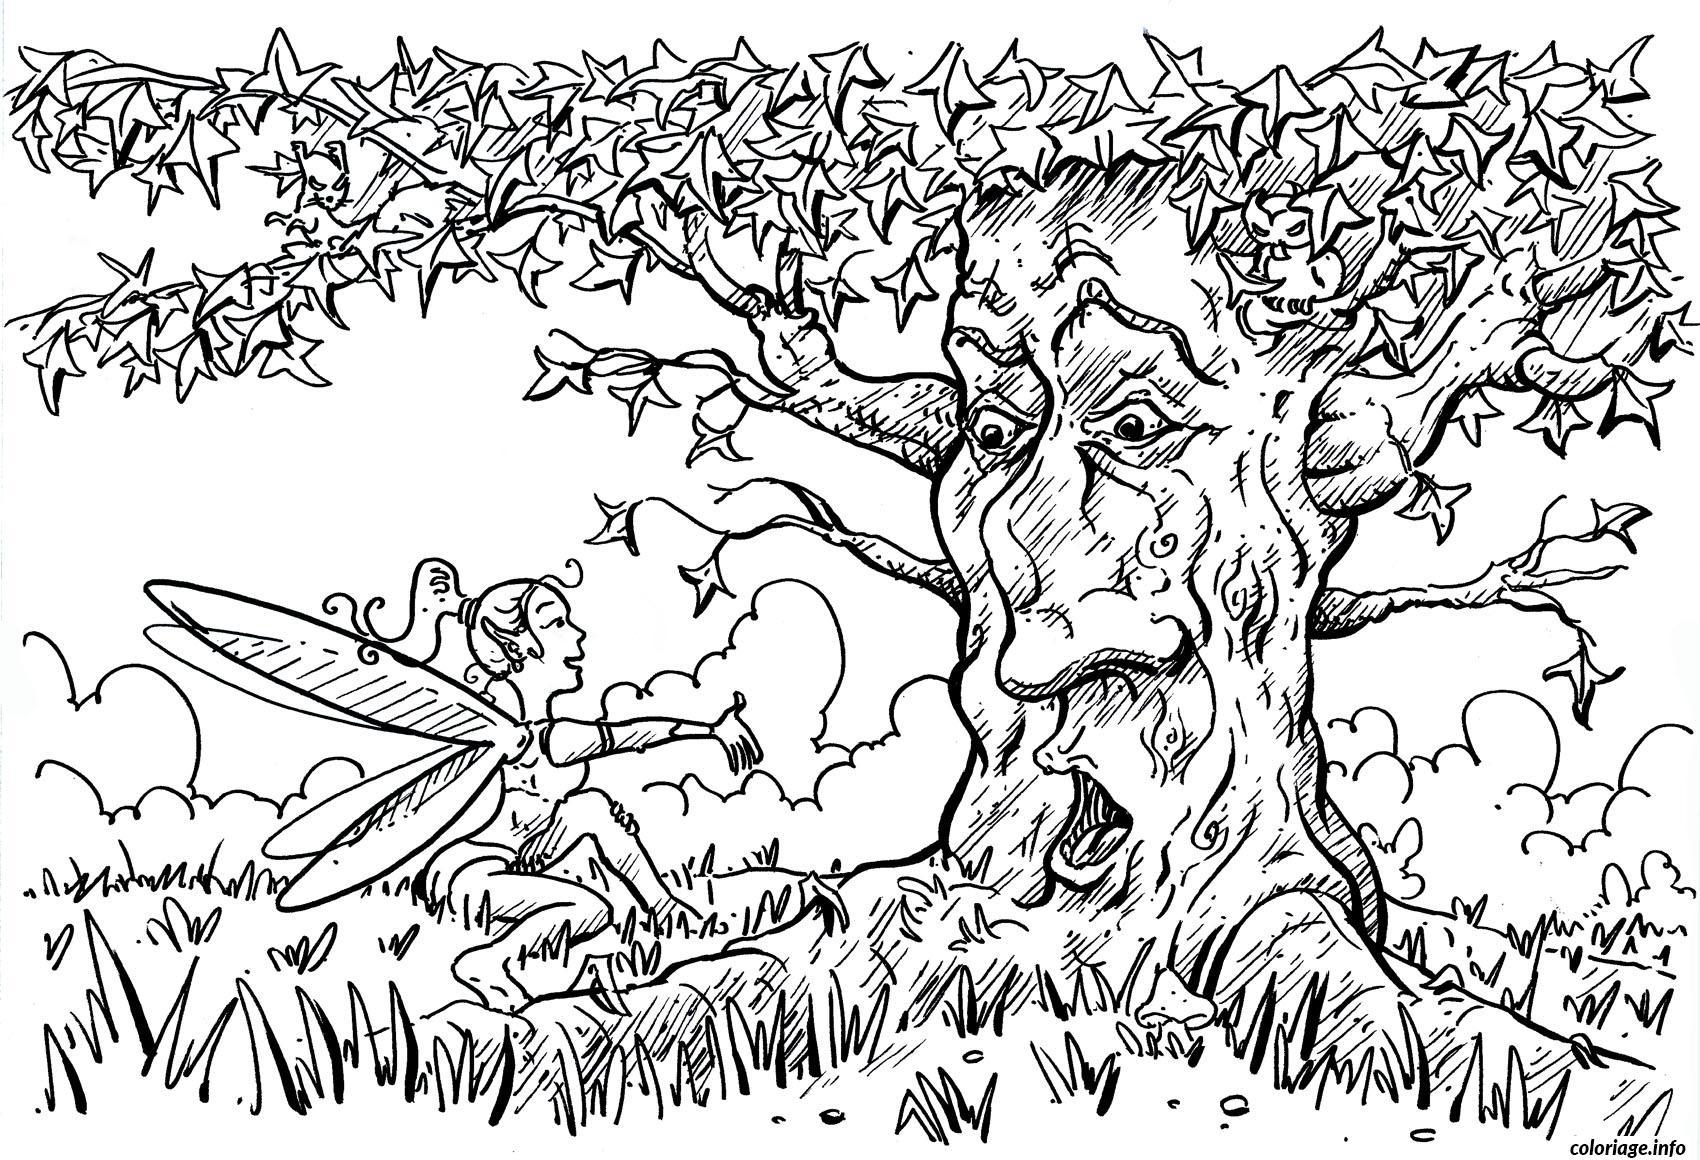 Dessin adulte dessin 78 Coloriage Gratuit à Imprimer